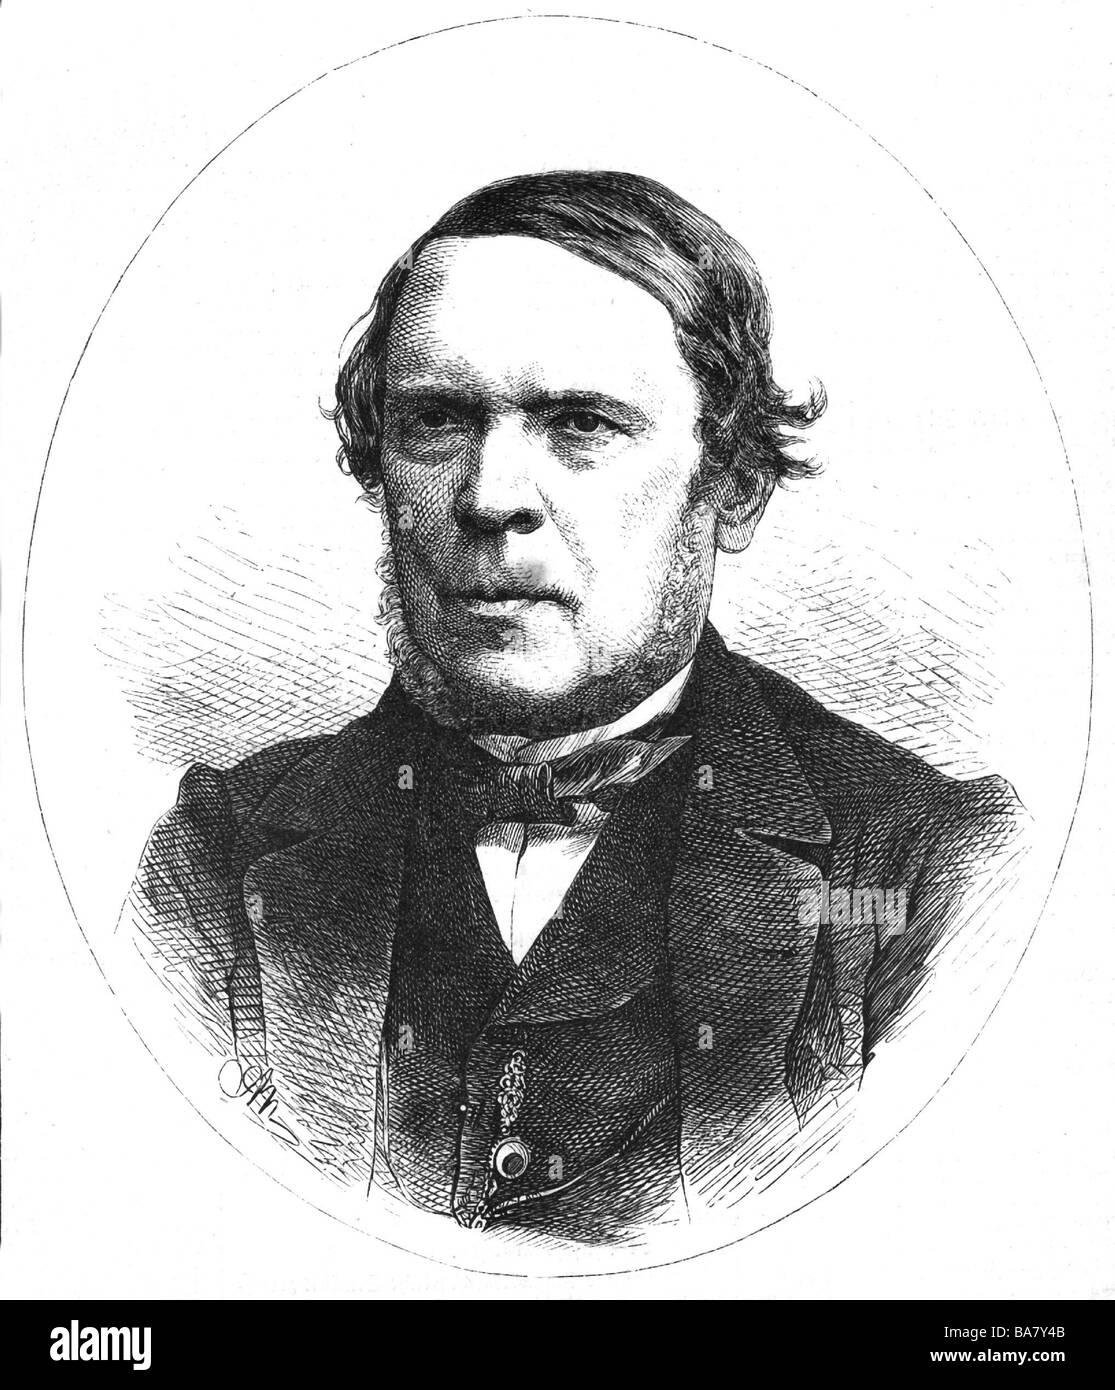 Halm, Friedrich, 2.4.1806 - 22.5.1871, Austrian author/writer (dramatist and novelist), portrait, wood engraving, 19th century, Stock Photo